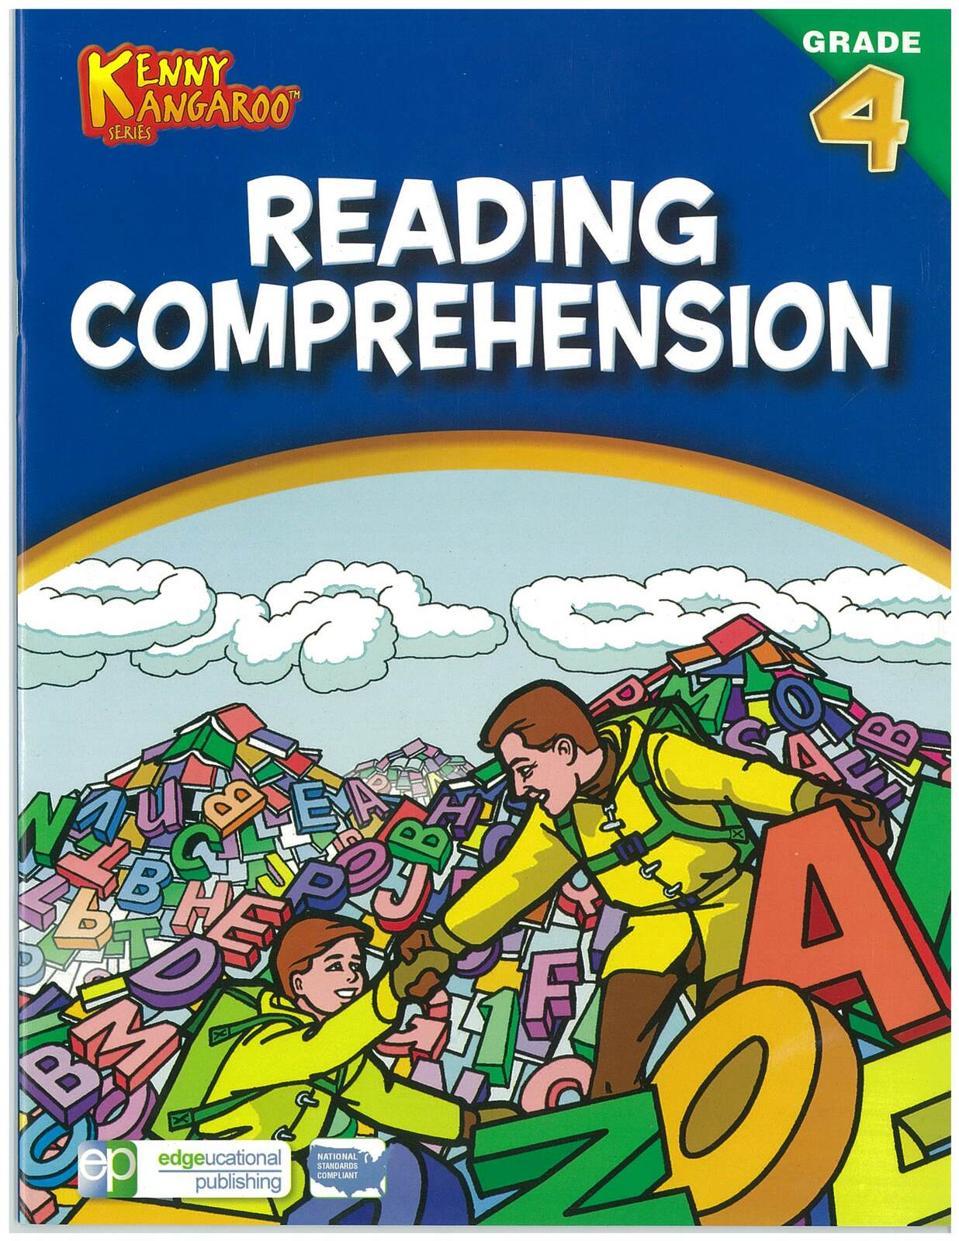 Reading Comprehension By Kenny Kangaroo Series